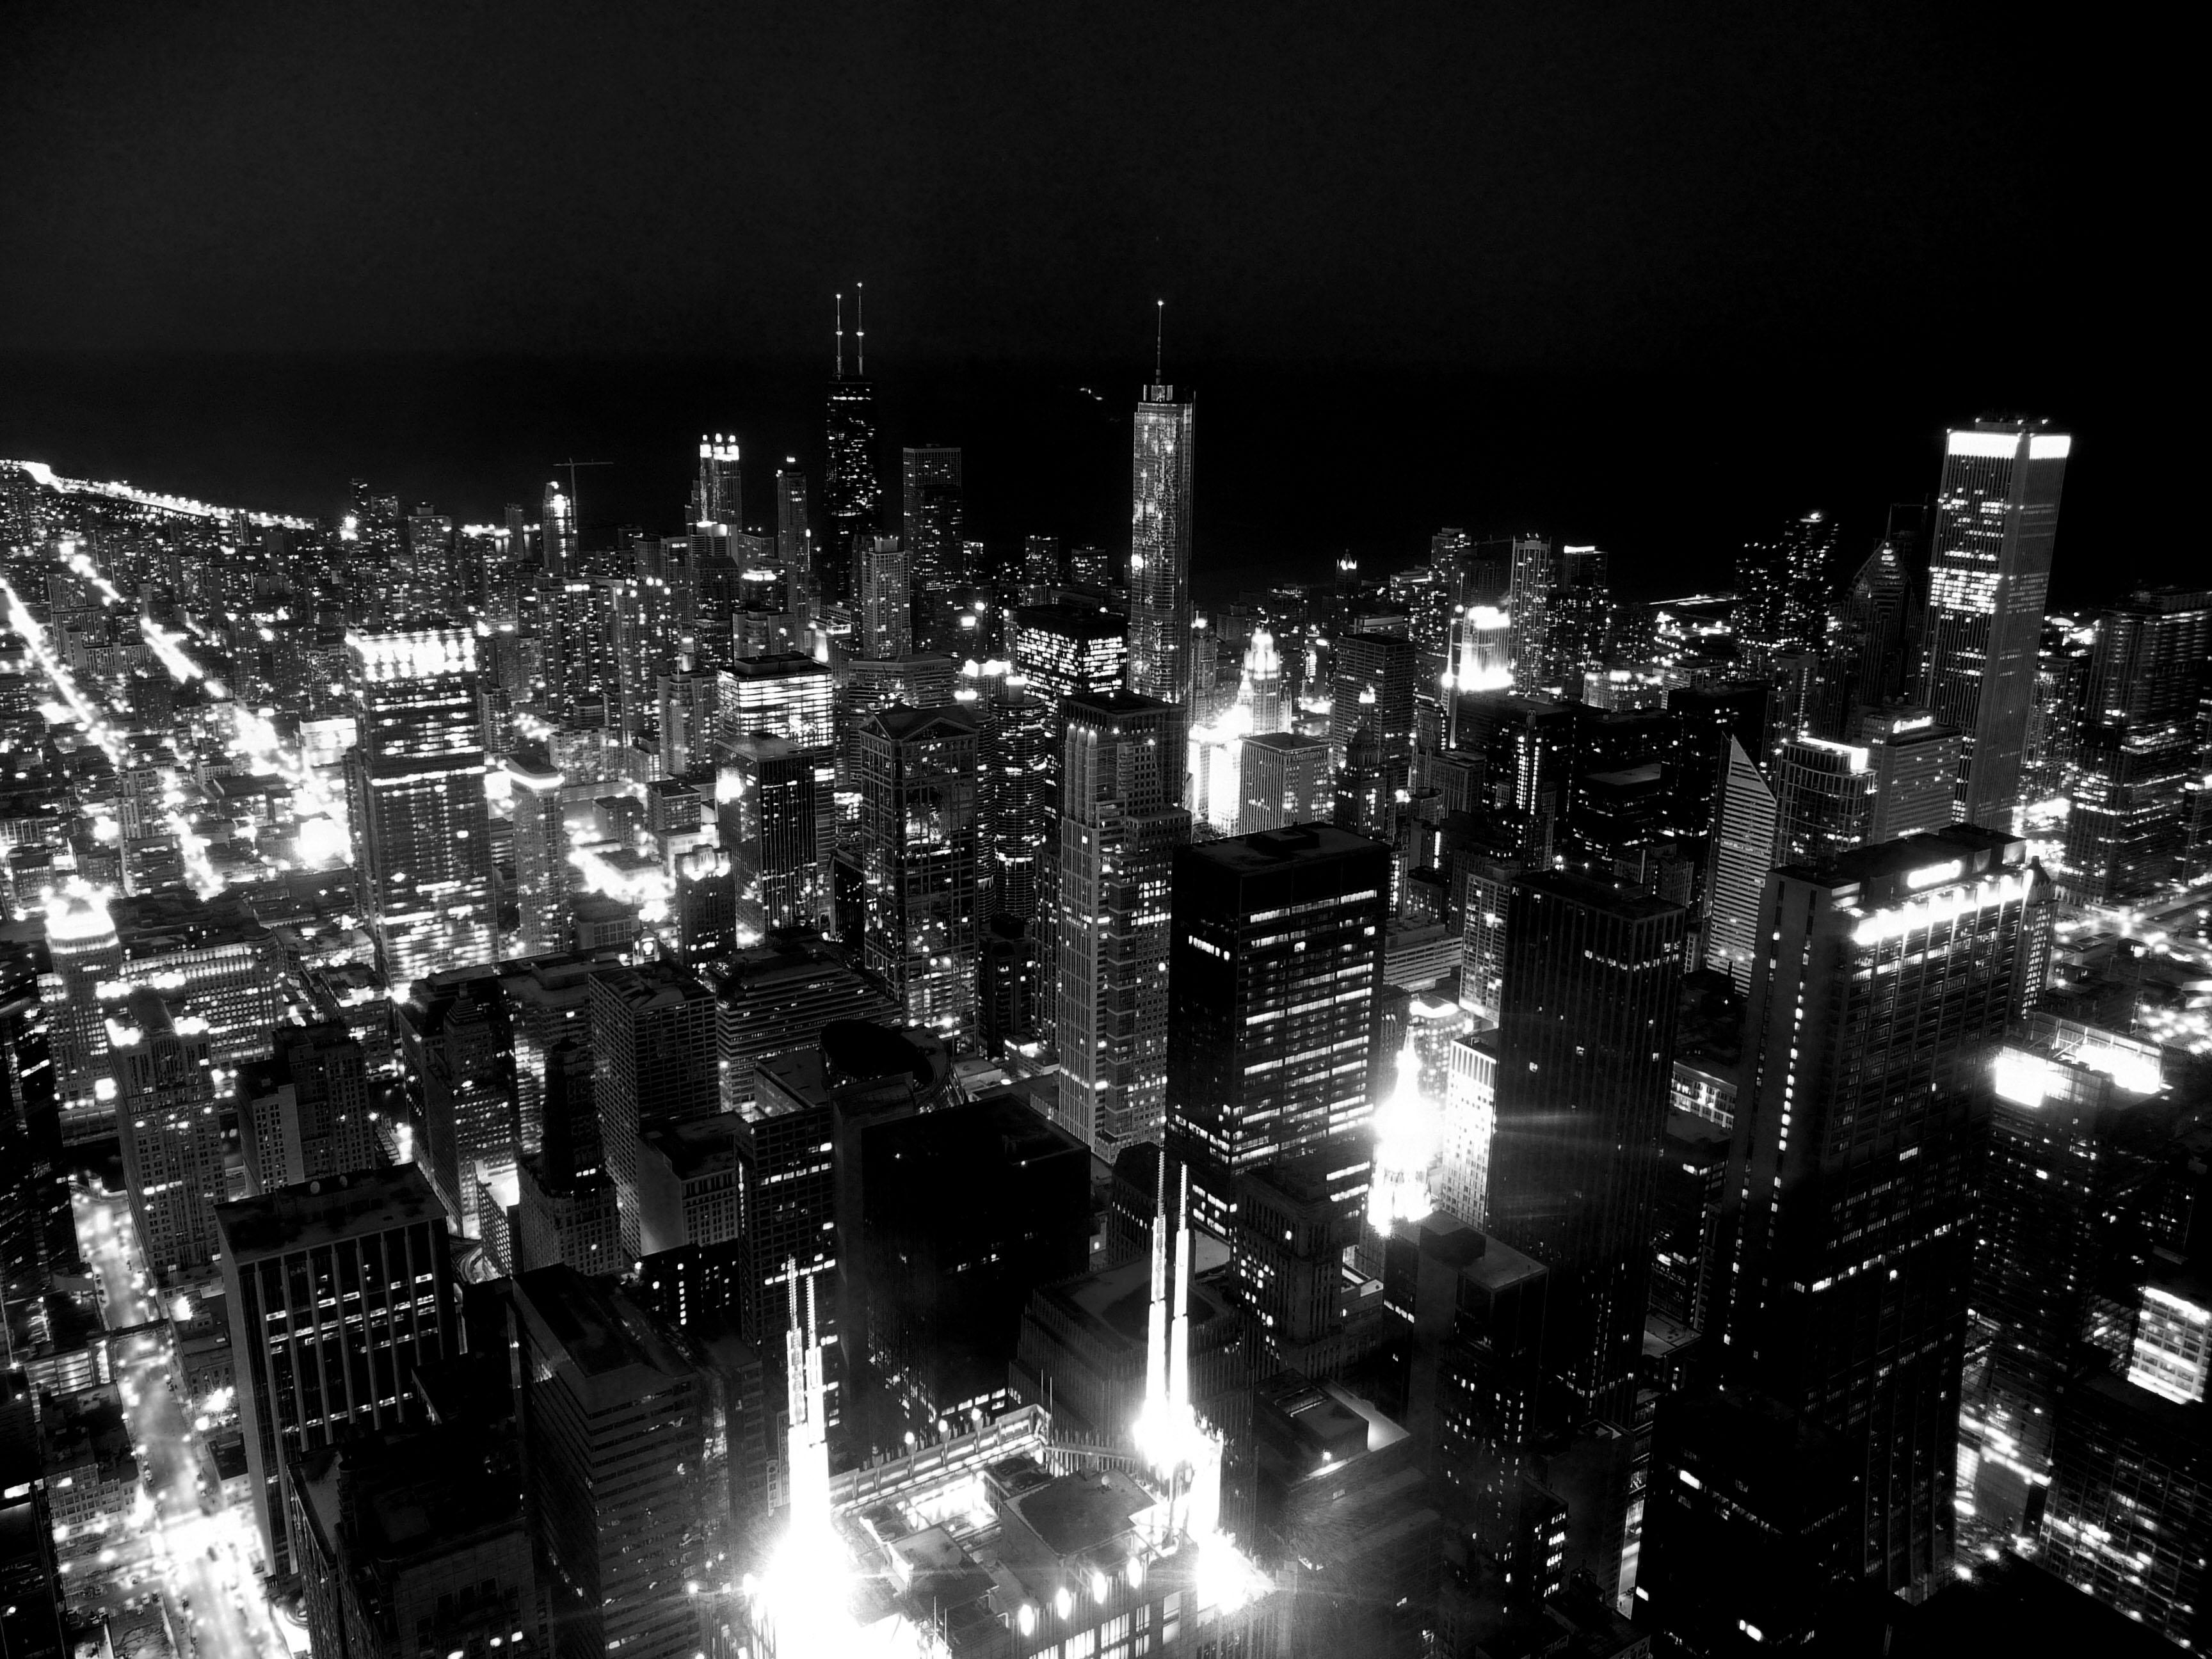 New York Wallpaper Black and White wallpaper wallpaper hd 3456x2592